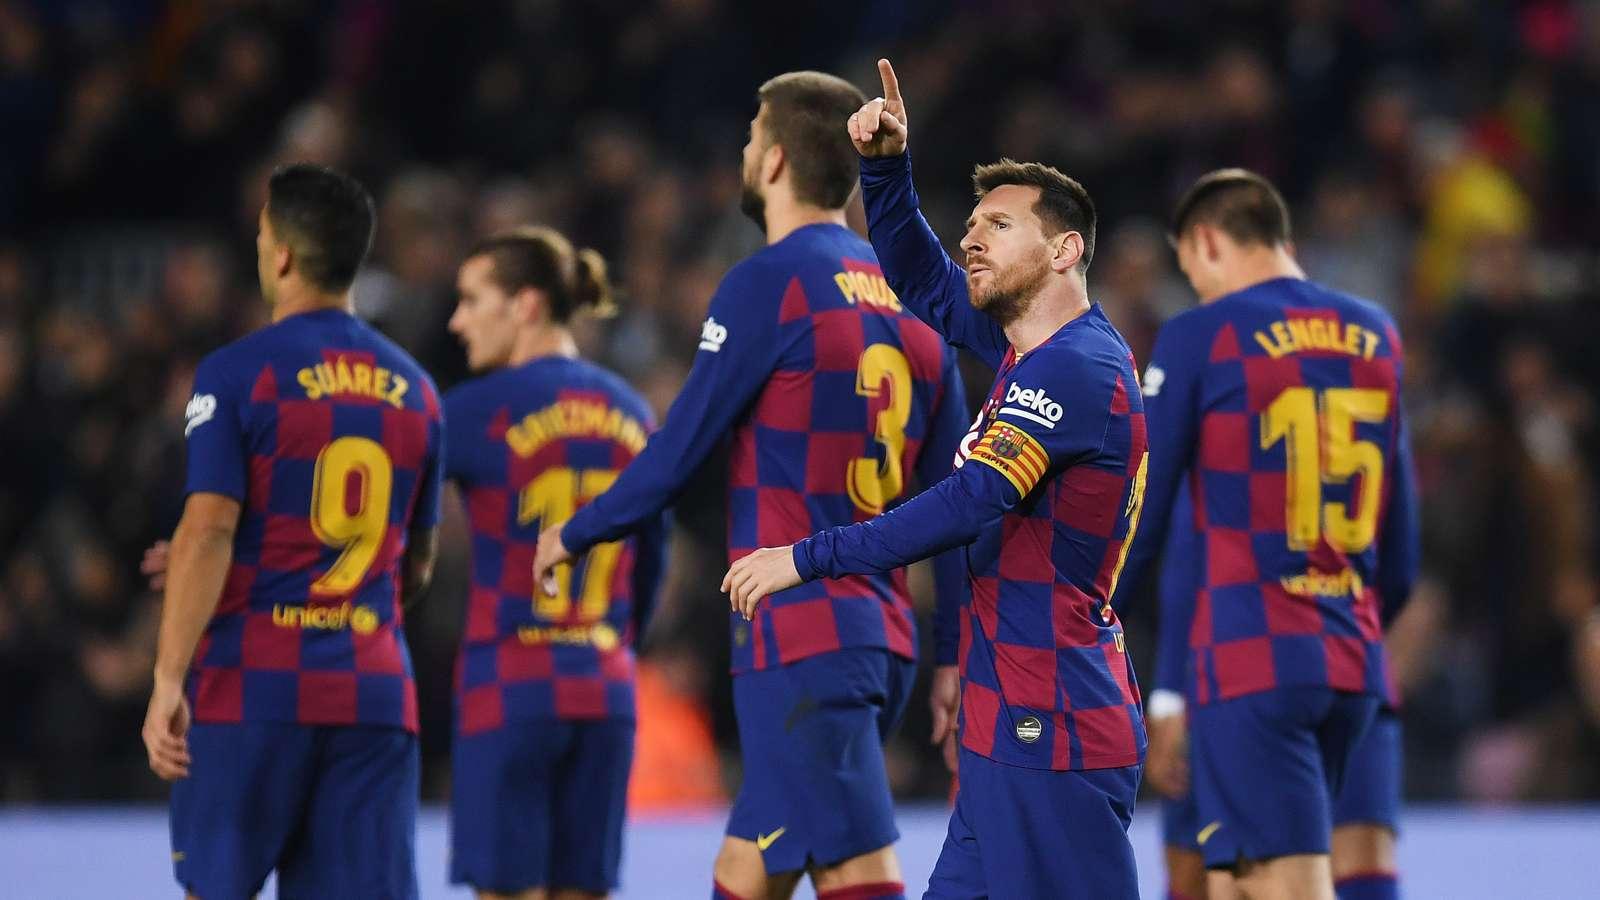 Messi surpasses Ronaldo as Barca star breaks more La Liga records - Bóng Đá